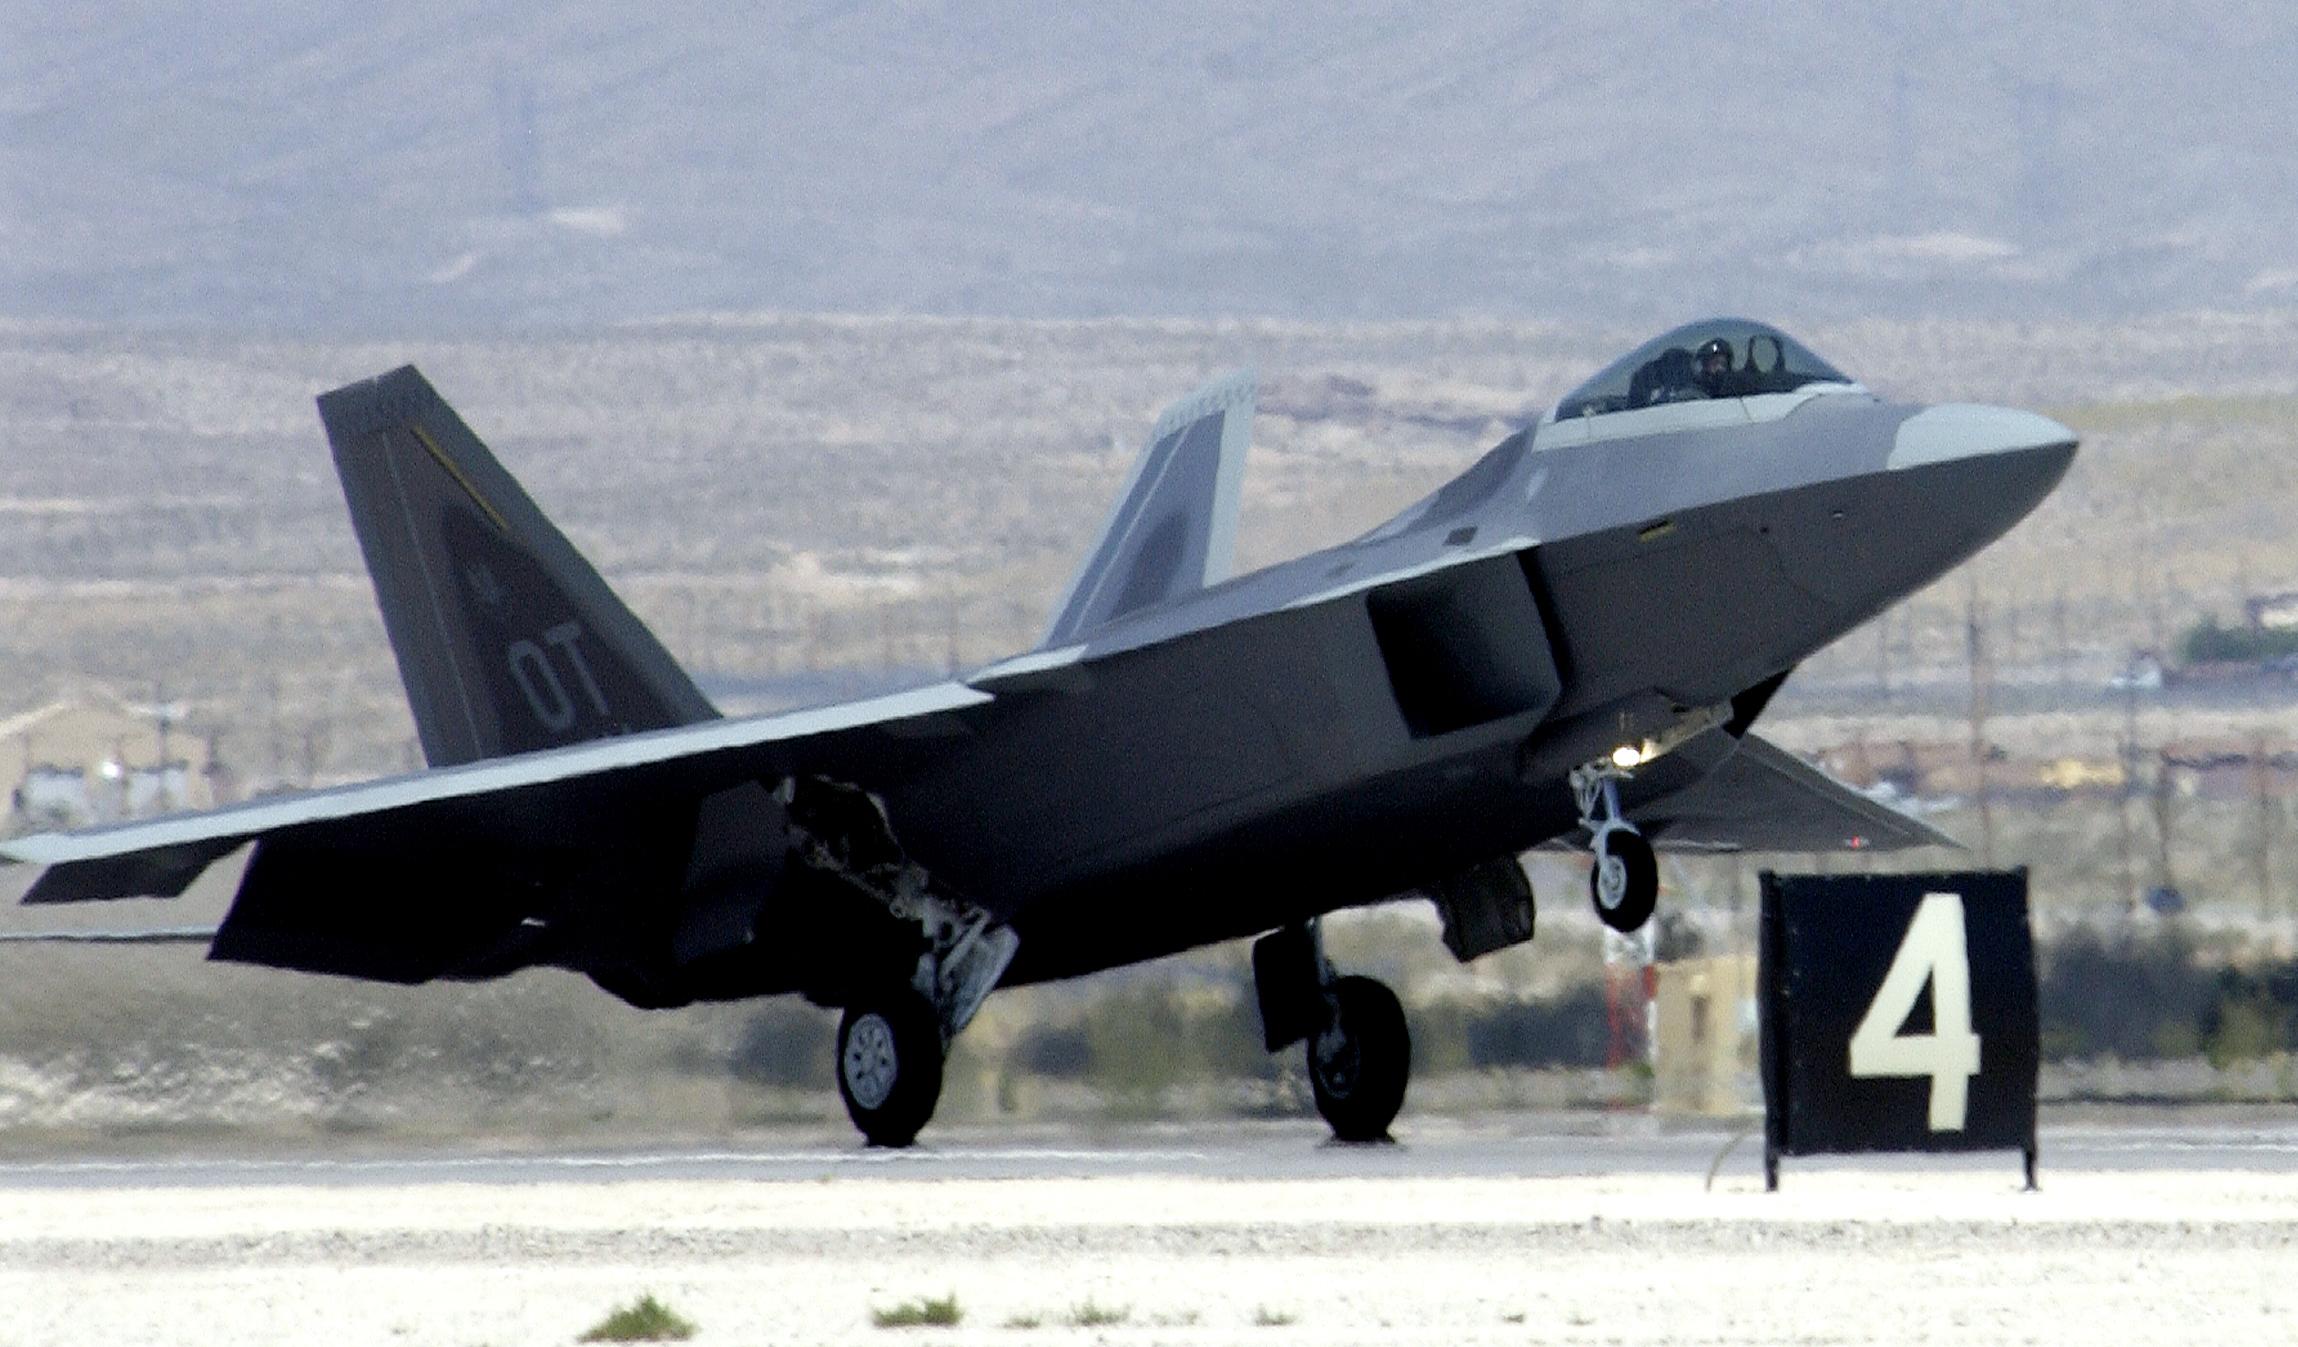 F-22_Raptor_landing_at_Nellis_AFB_-_030529-F-2185F-001.jpg